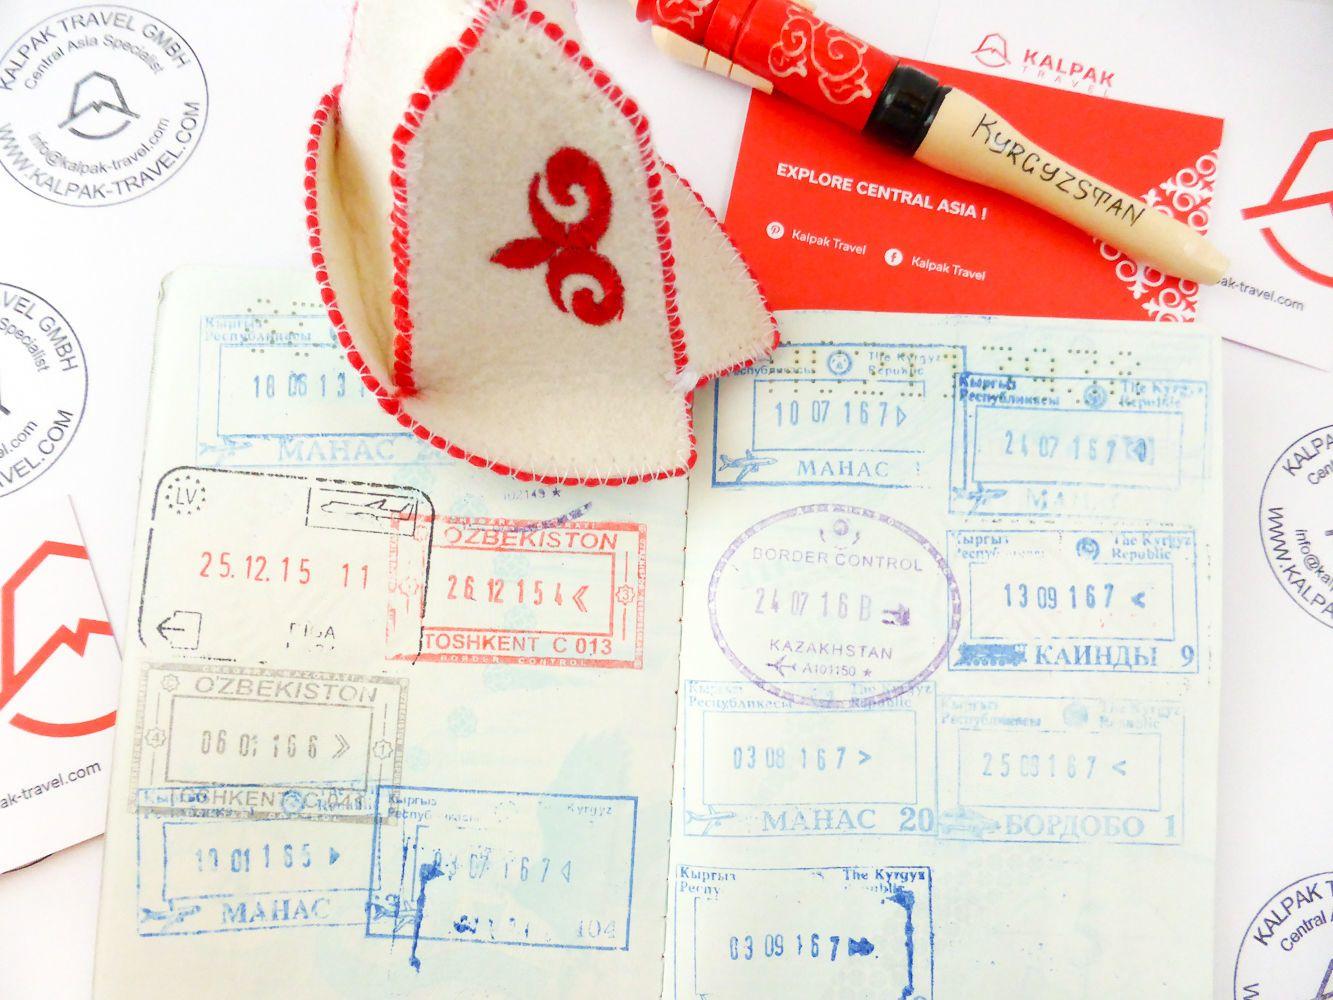 Visa-Guide für Zentralasien: Kirgisistan, Kasachstan, Tadschikistan, Turkmenistan, Usbekistan